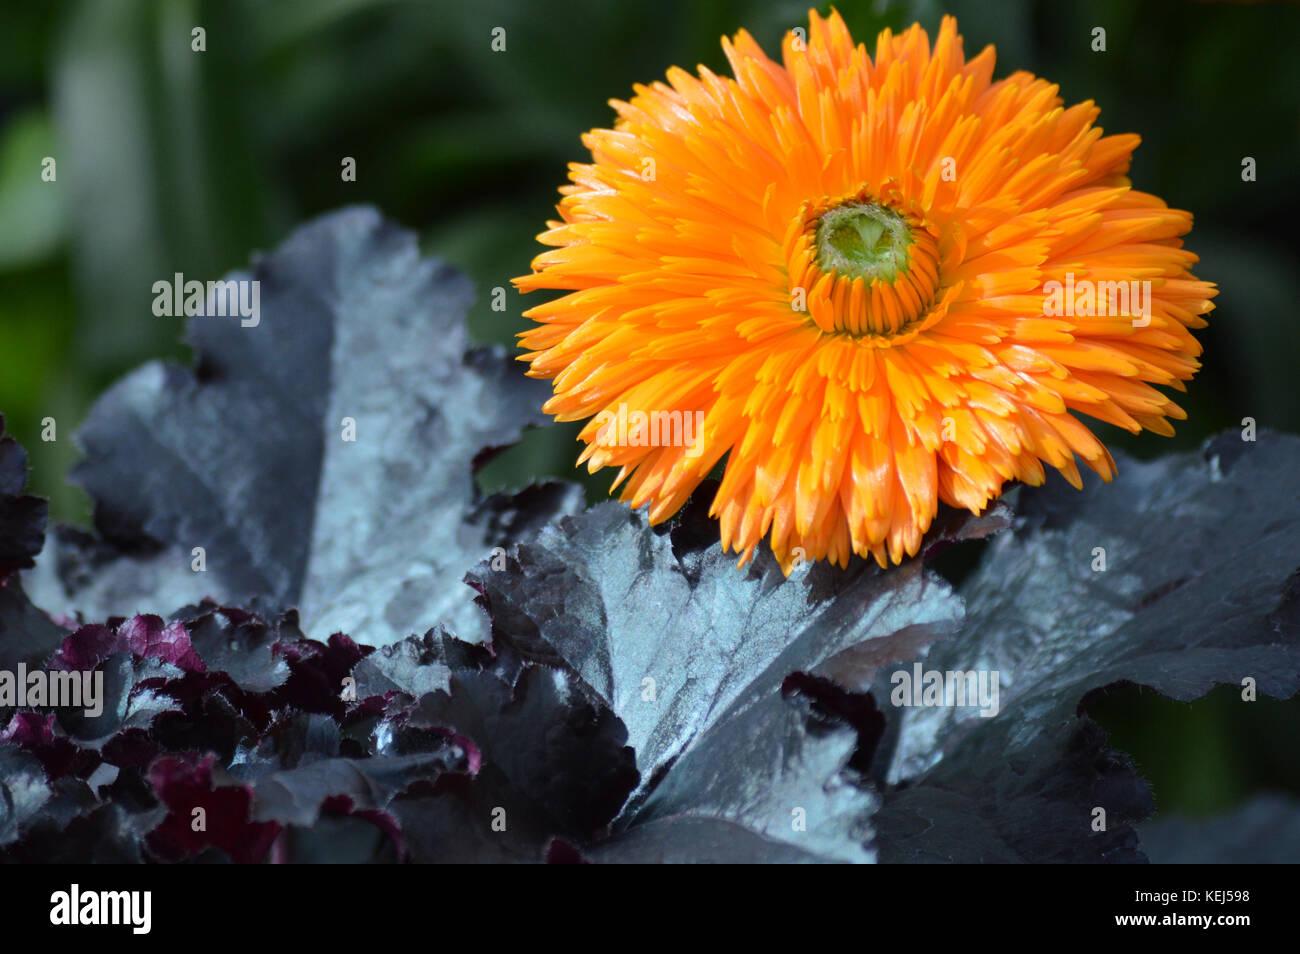 Mum Flower In The Garden Stock Photo Alamy